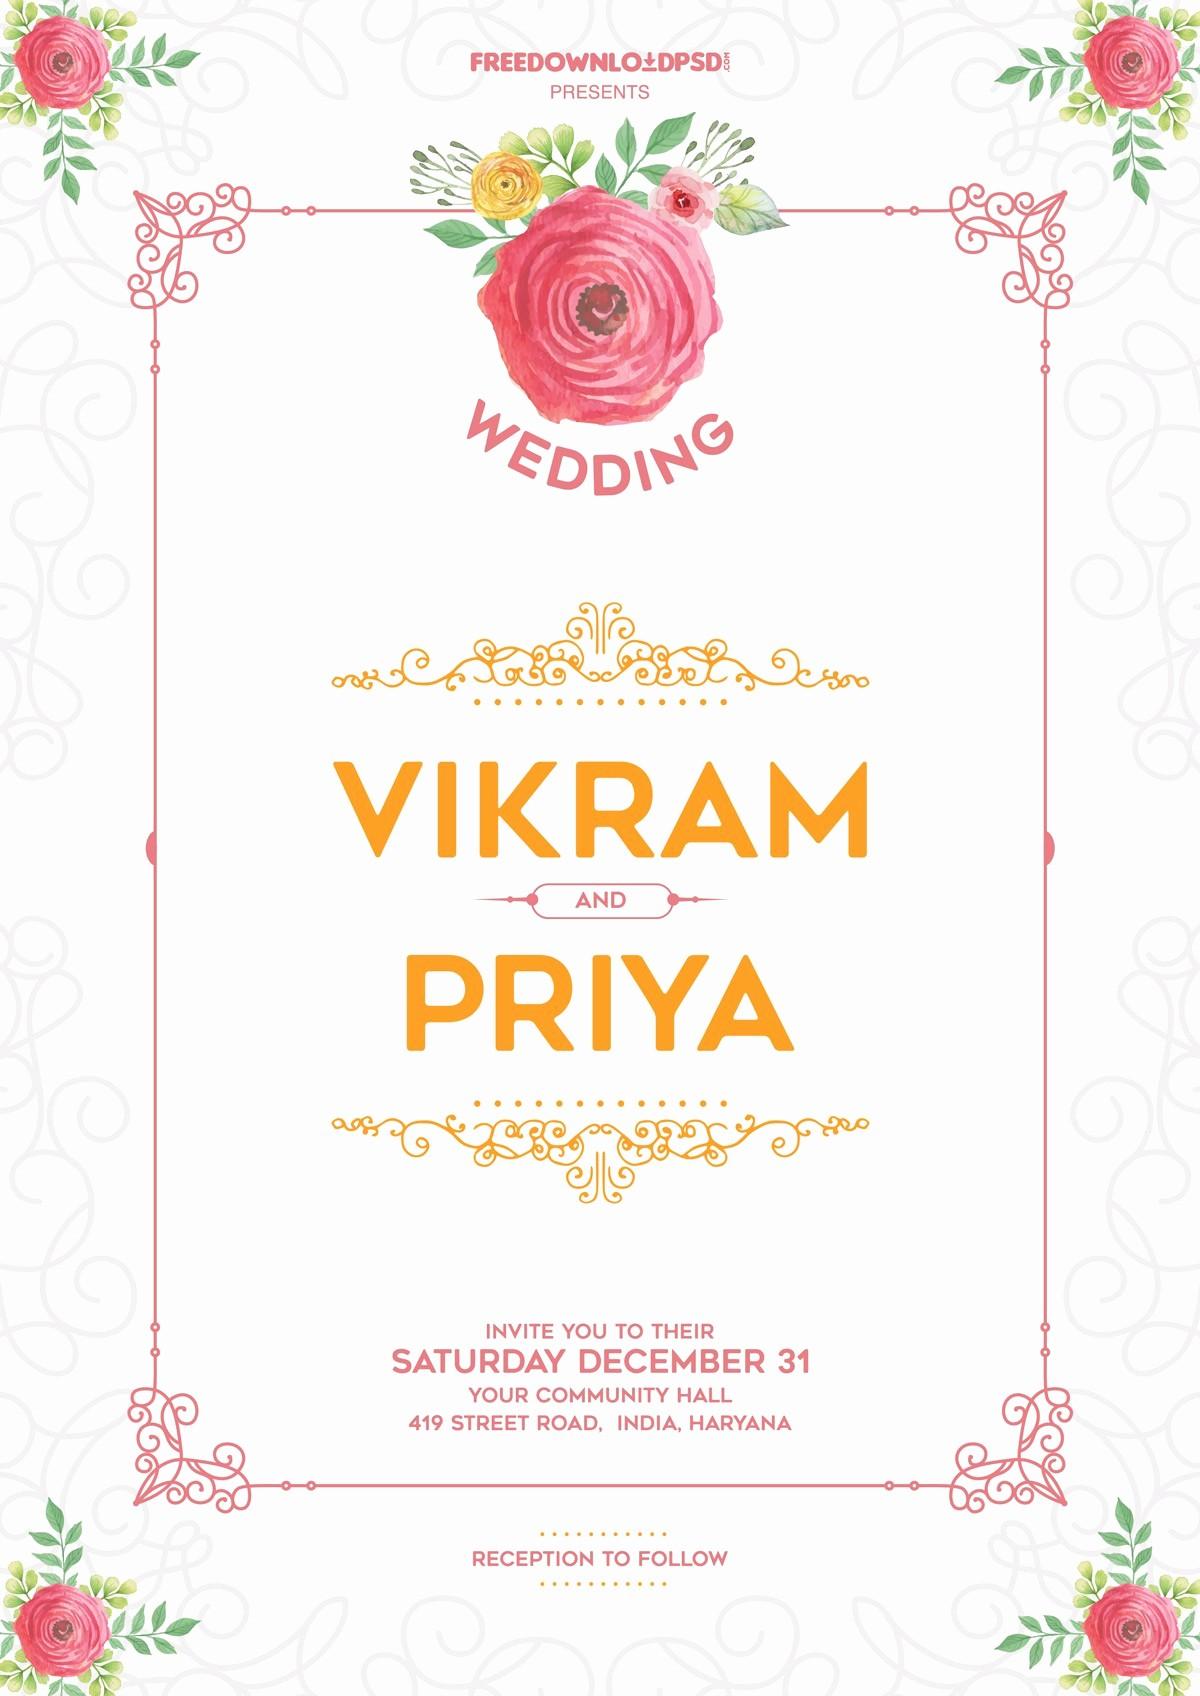 Free Wedding Templates Microsoft Word Awesome Luxury Free Printable Wedding Invitation Templates for